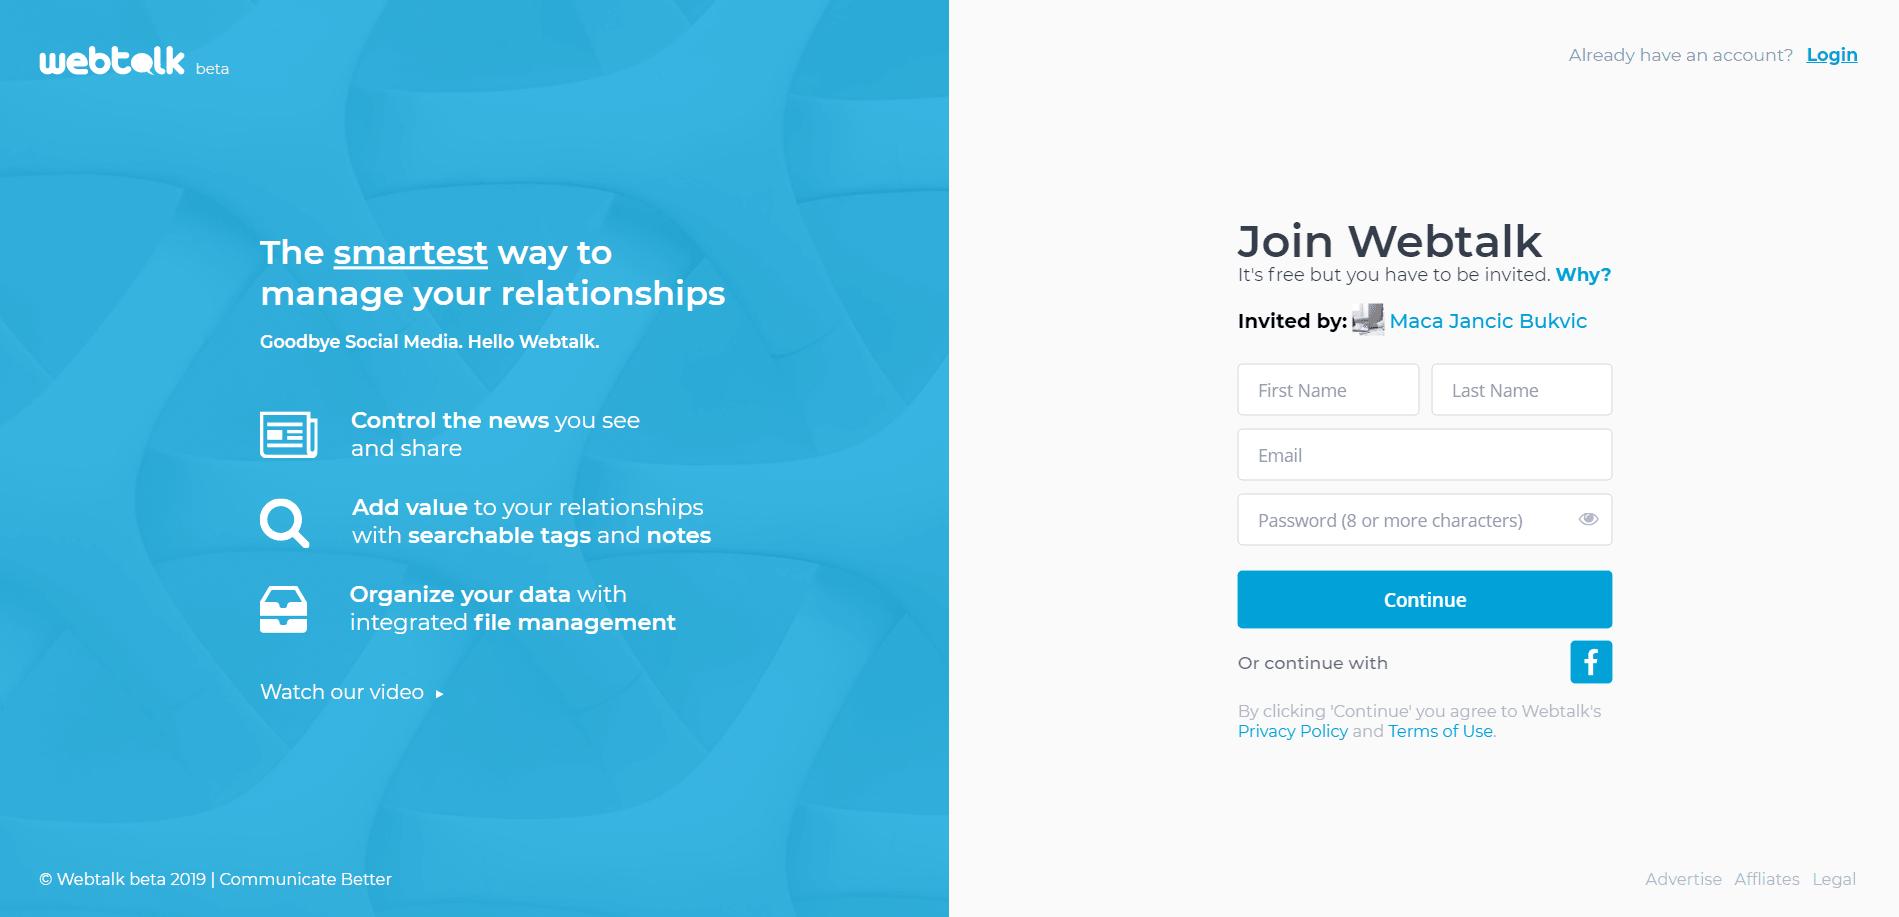 Is Webtalk a Scam - Landing Page